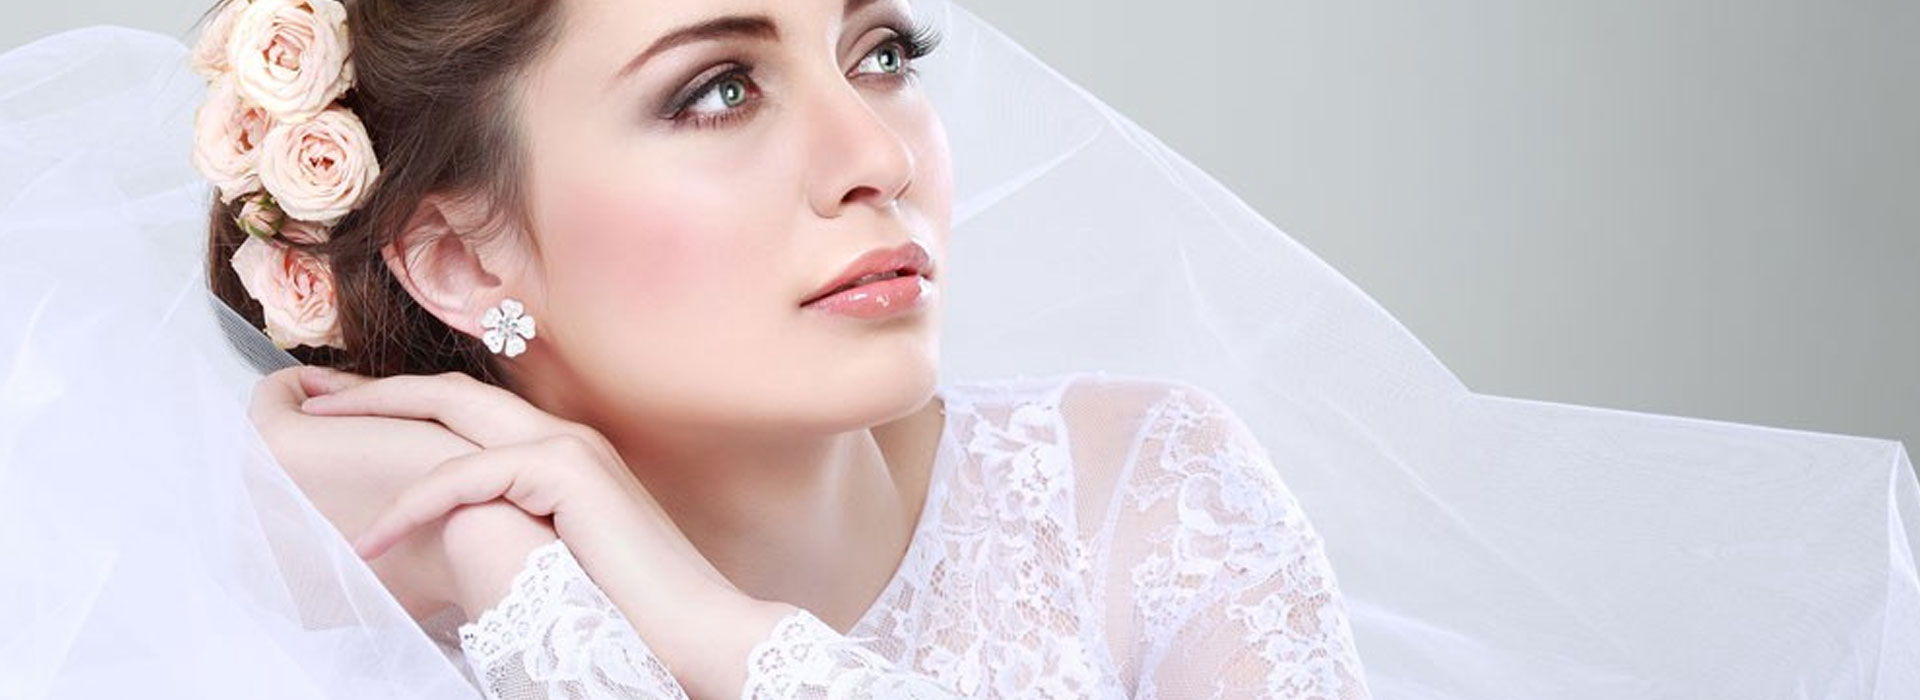 Bridal Skin Care Treatment